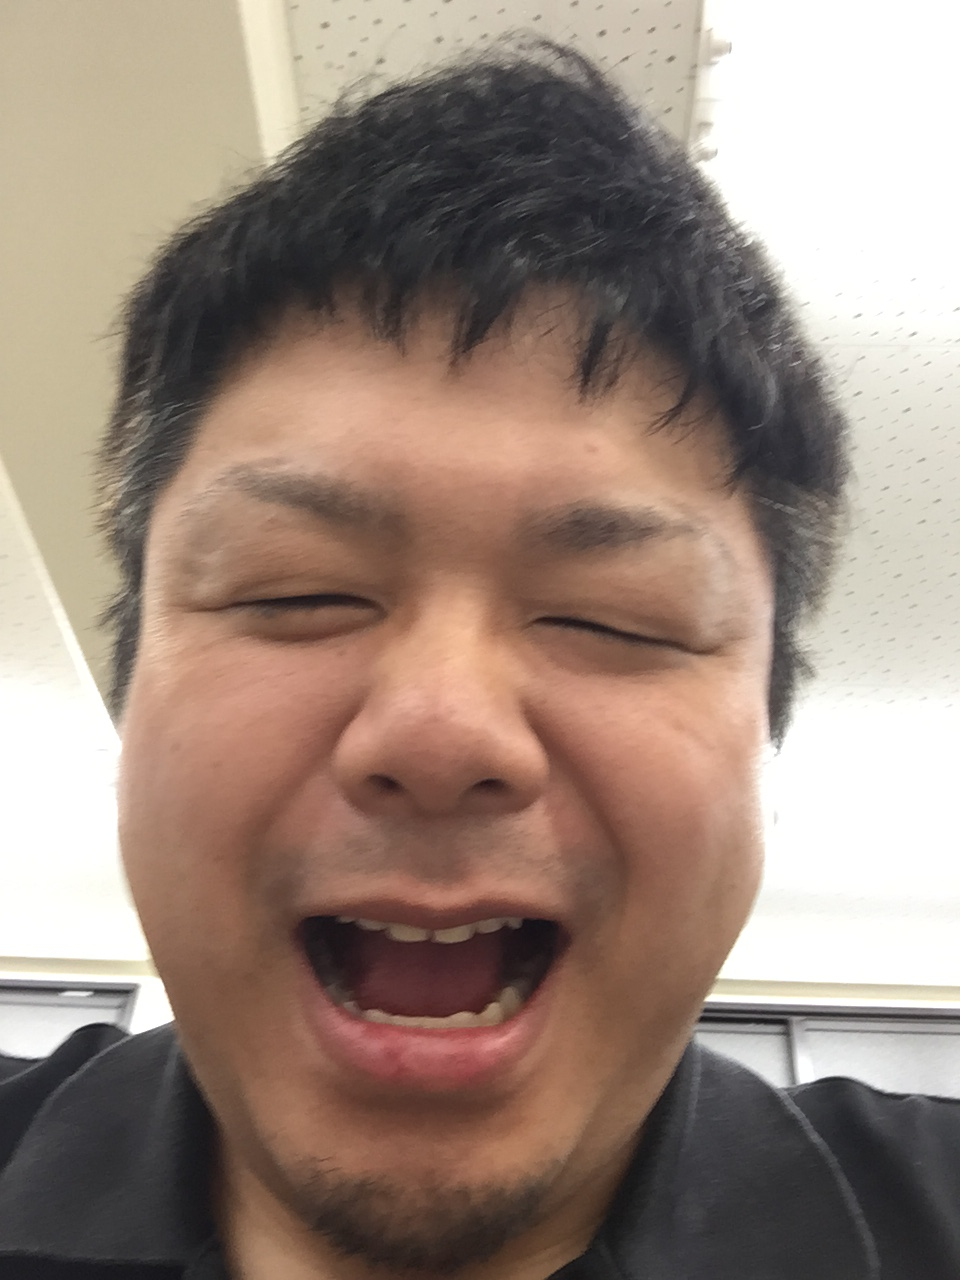 http://www.r-ac.jp/campus/osaka/blog/img/016.JPG